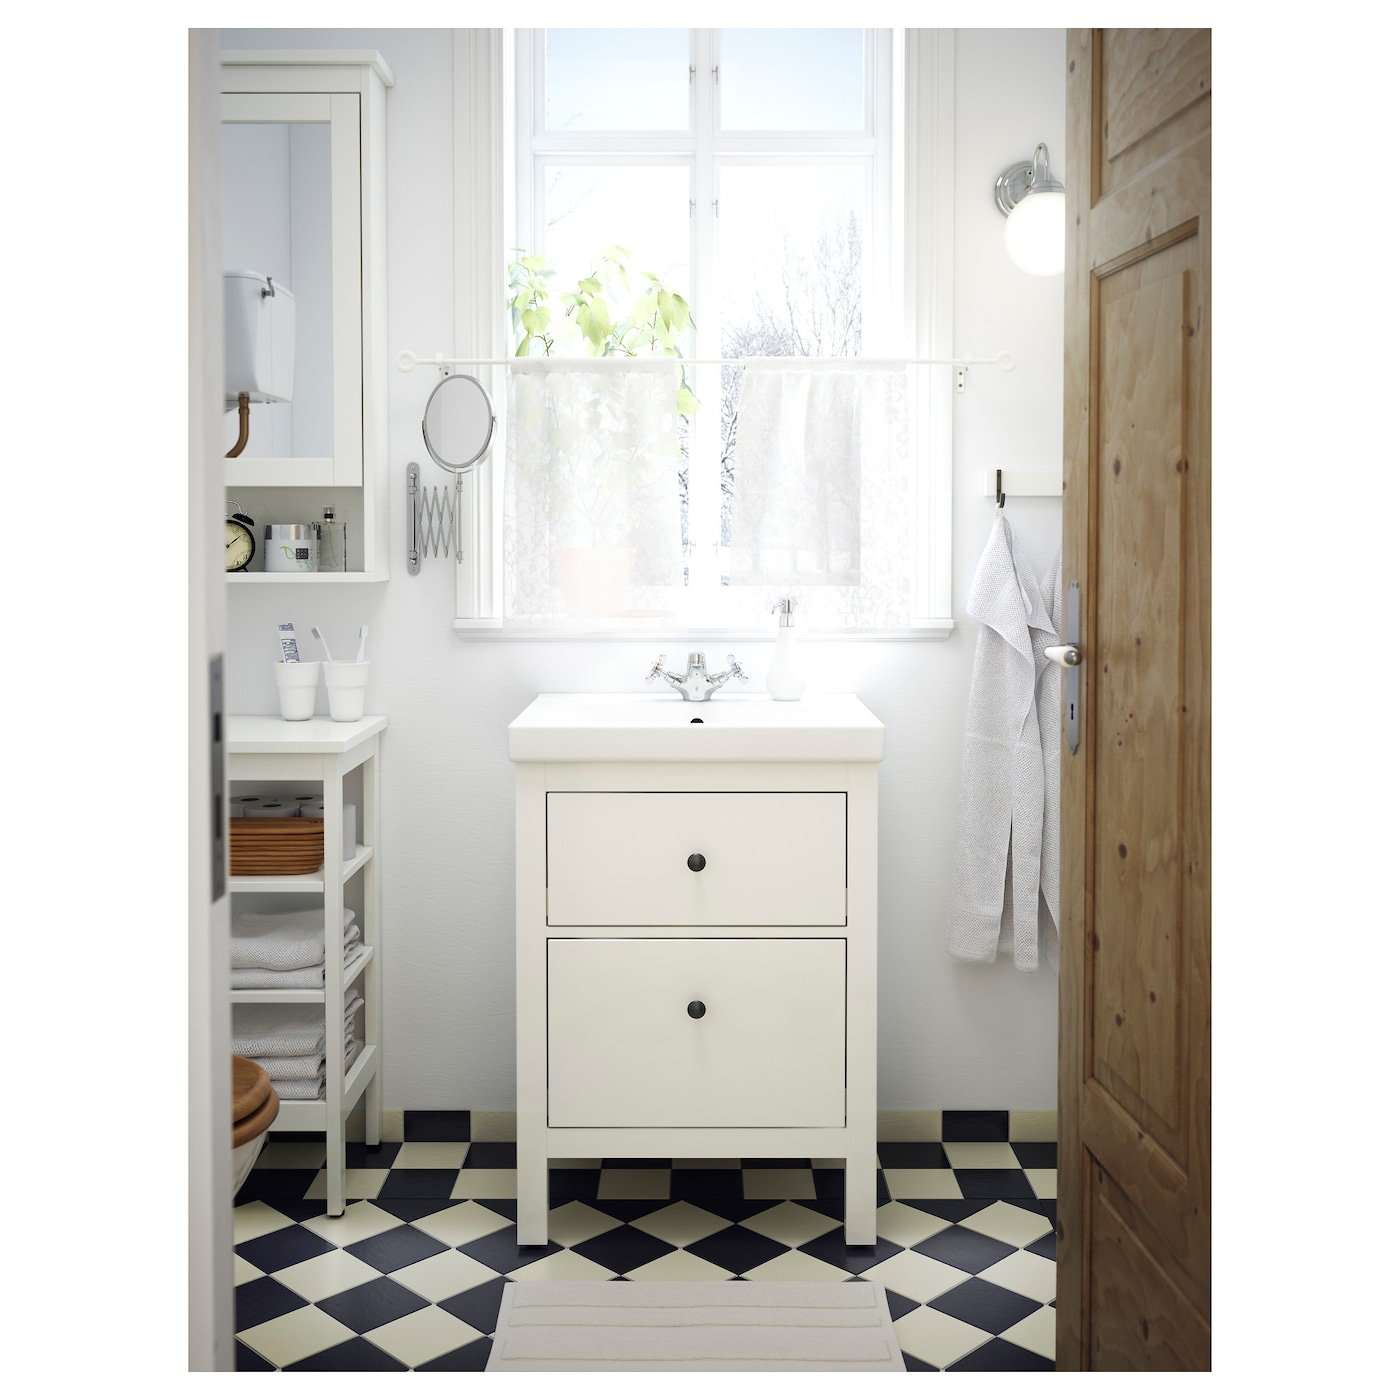 "HEMNES / ODENSVIK Bathroom vanity - white/Runskär faucet 8 8/8x8 8/8x85 ""  (68x8x8 cm)"